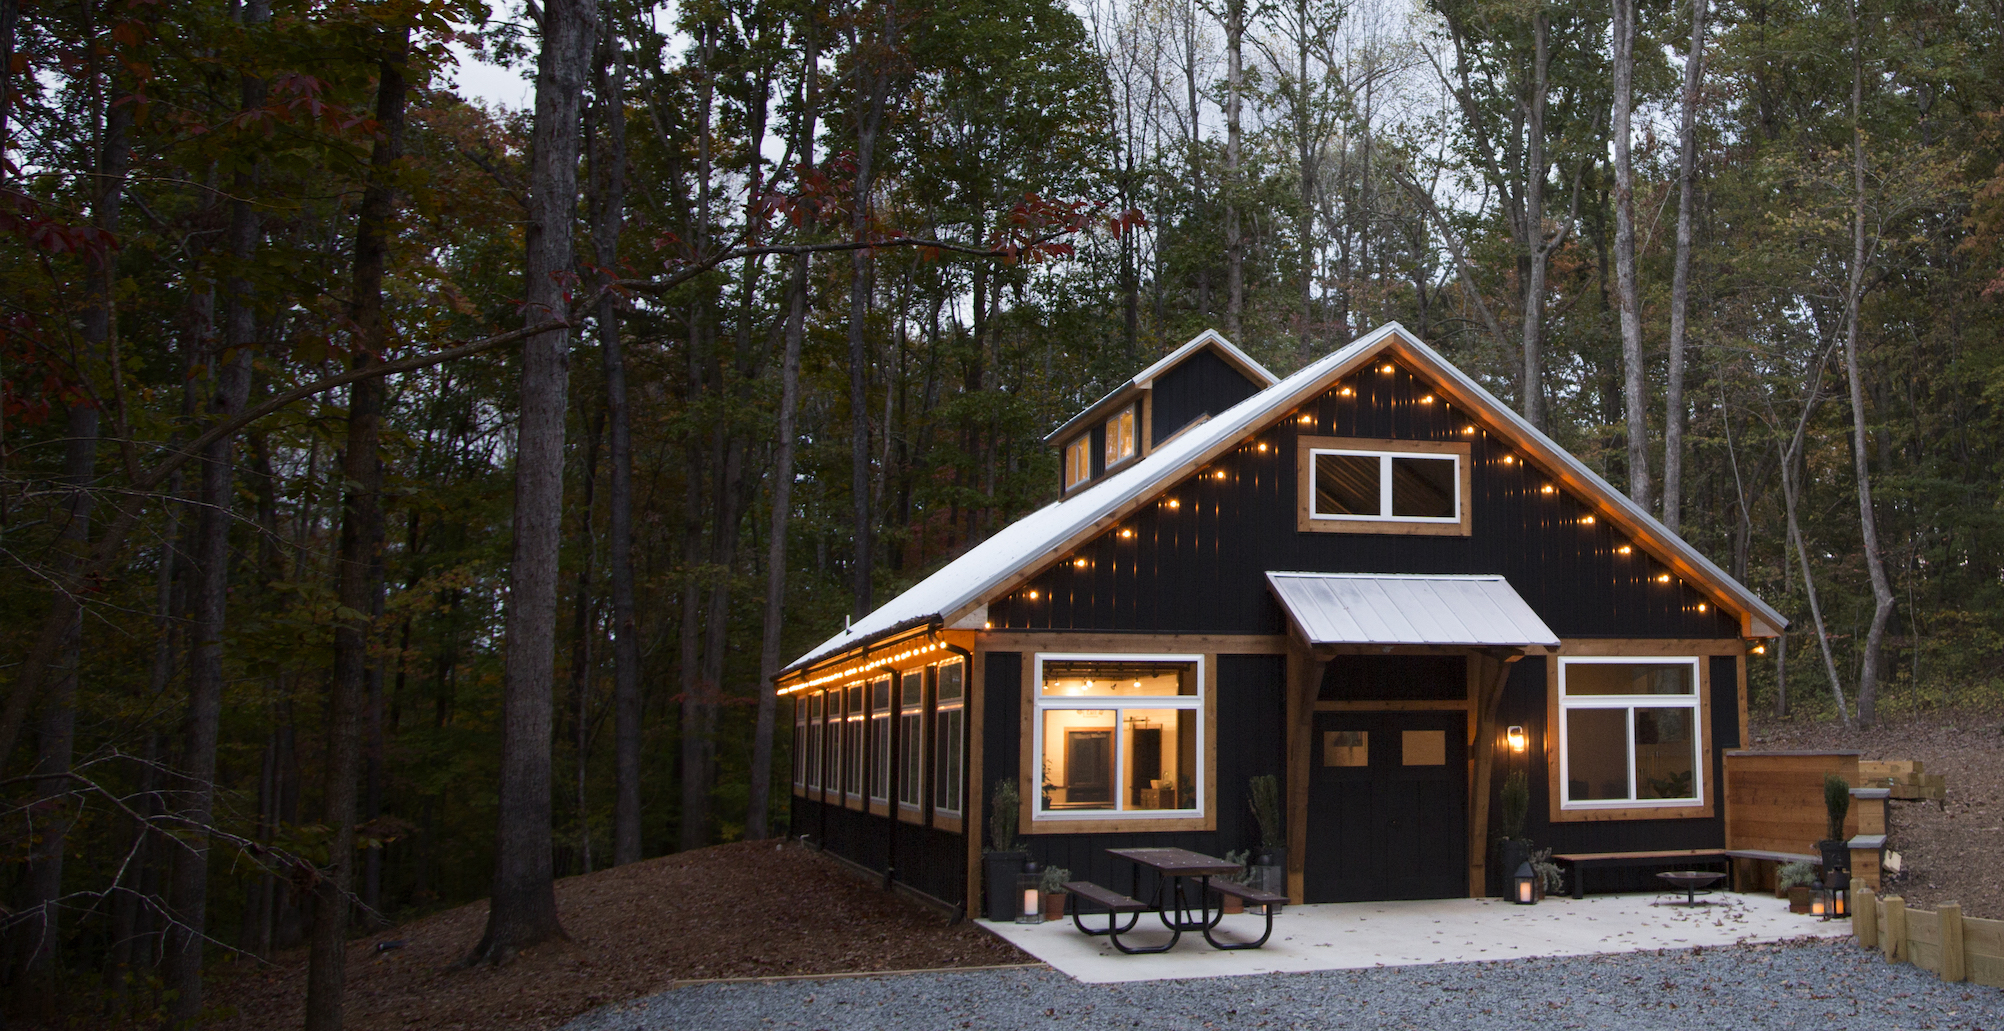 Blog jonathan david melissa helser thank you we completed the art barn stopboris Gallery